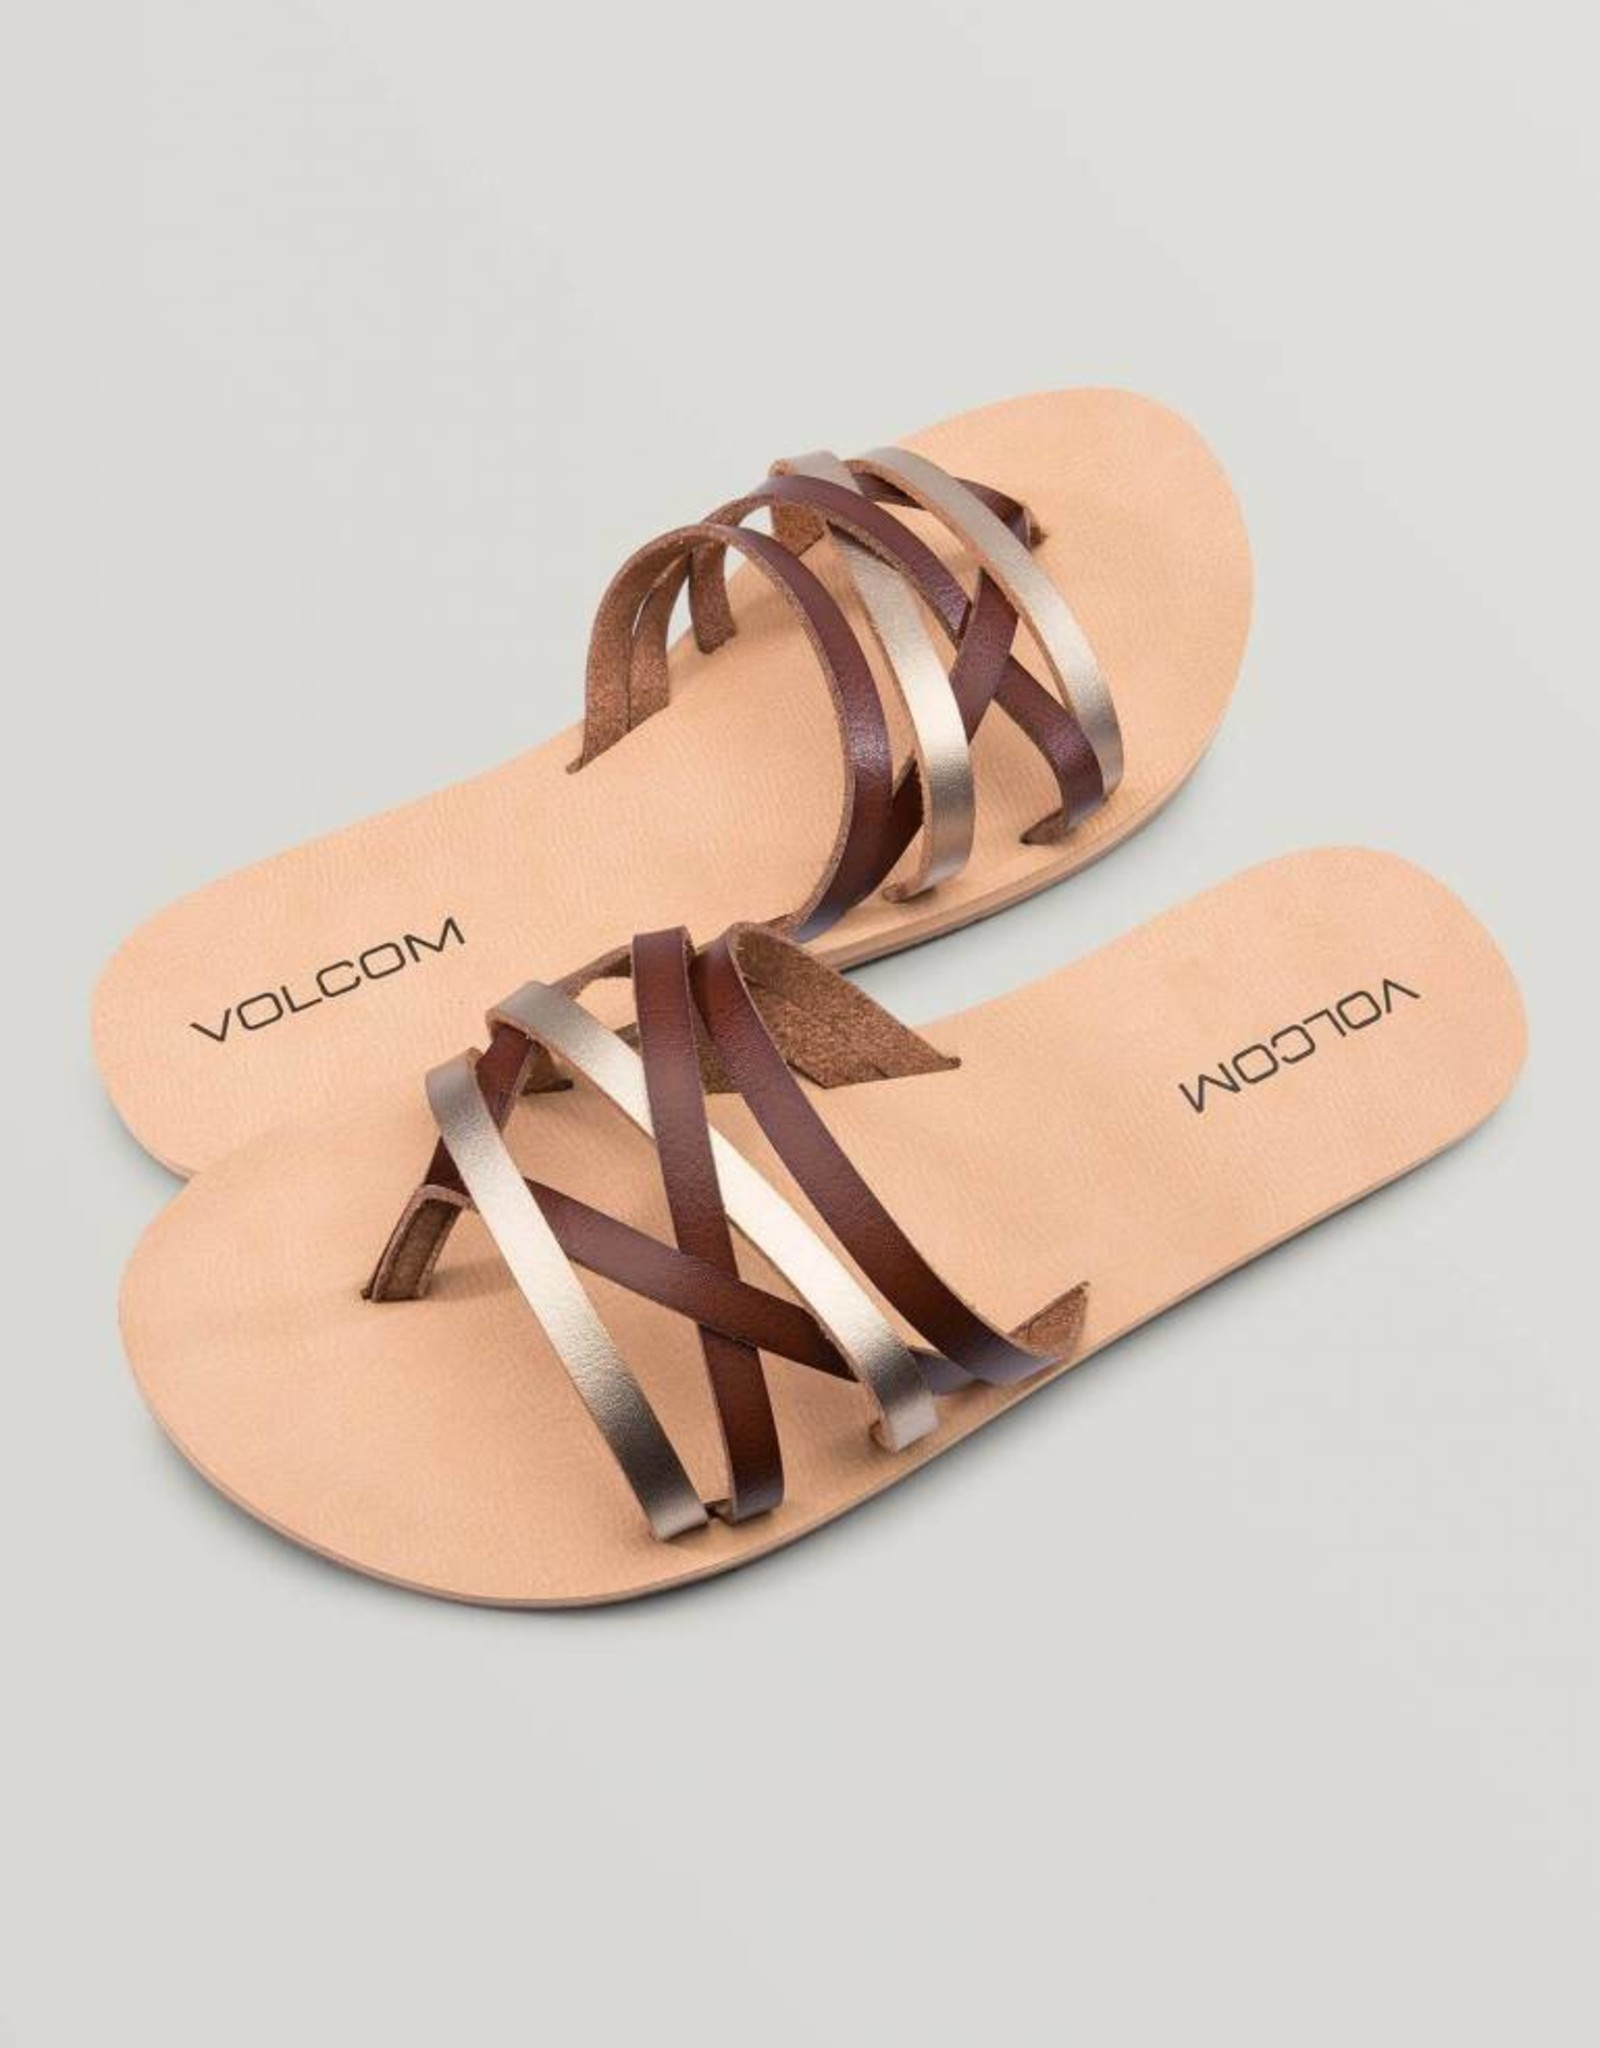 Volcom Volcom - Wmns LEGACY Sandal - Copper -